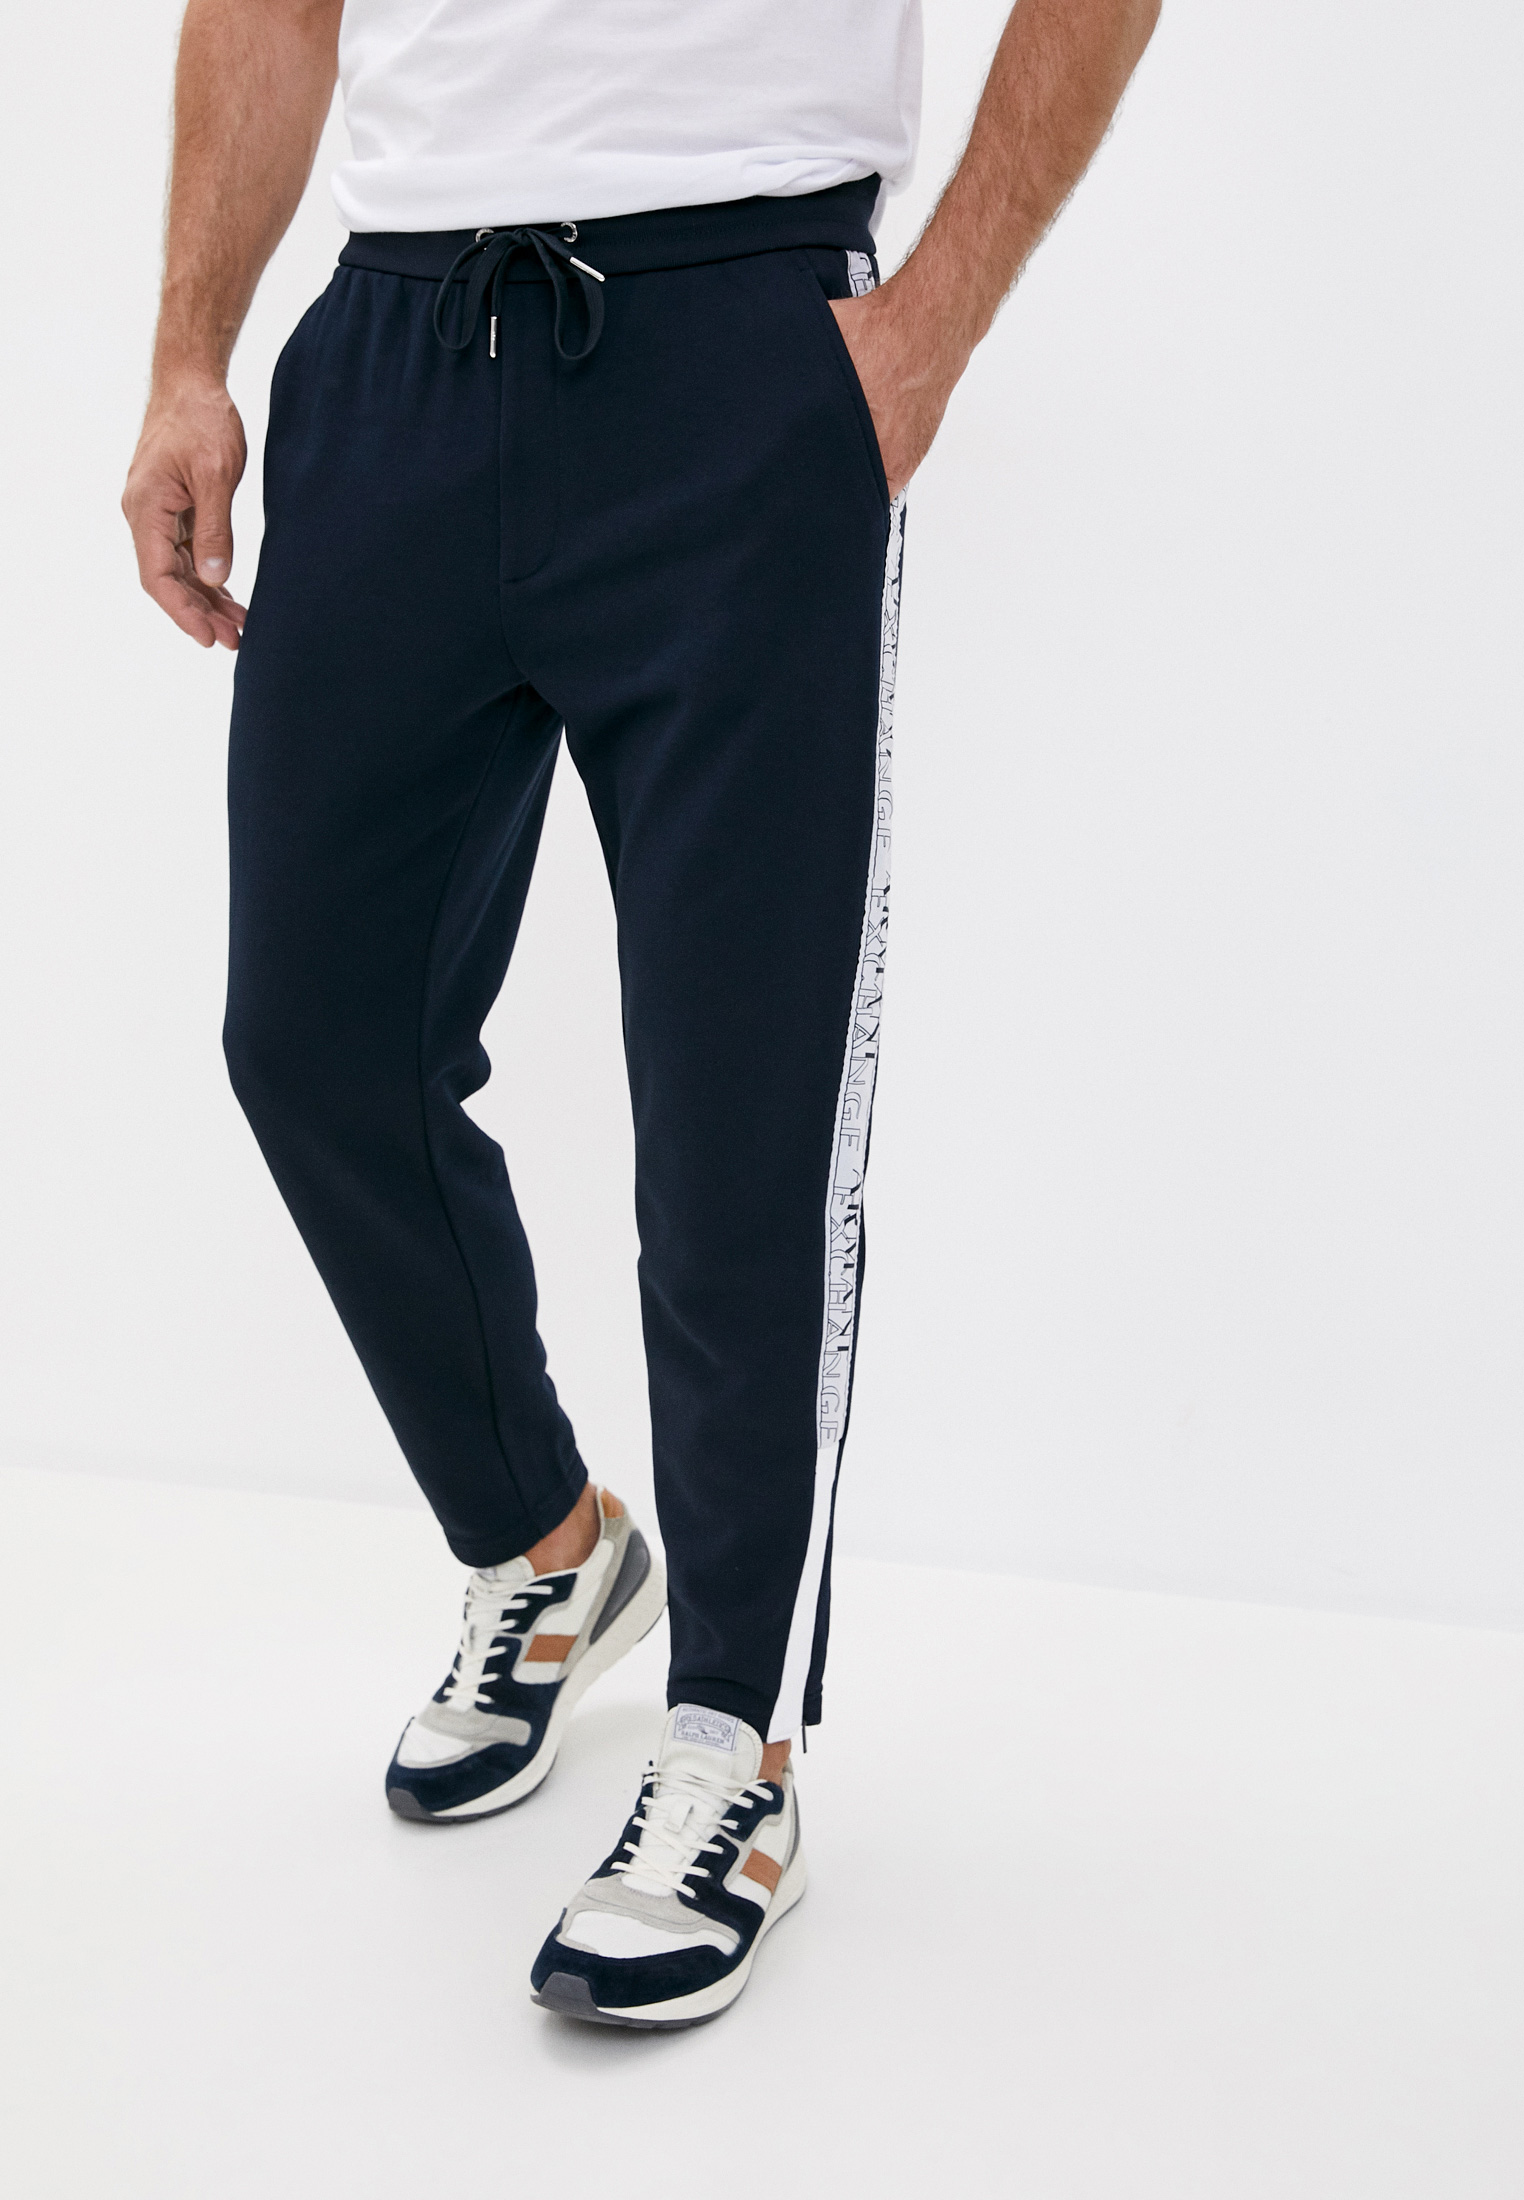 Мужские спортивные брюки Armani Exchange 6hzpff ZJ8CZ